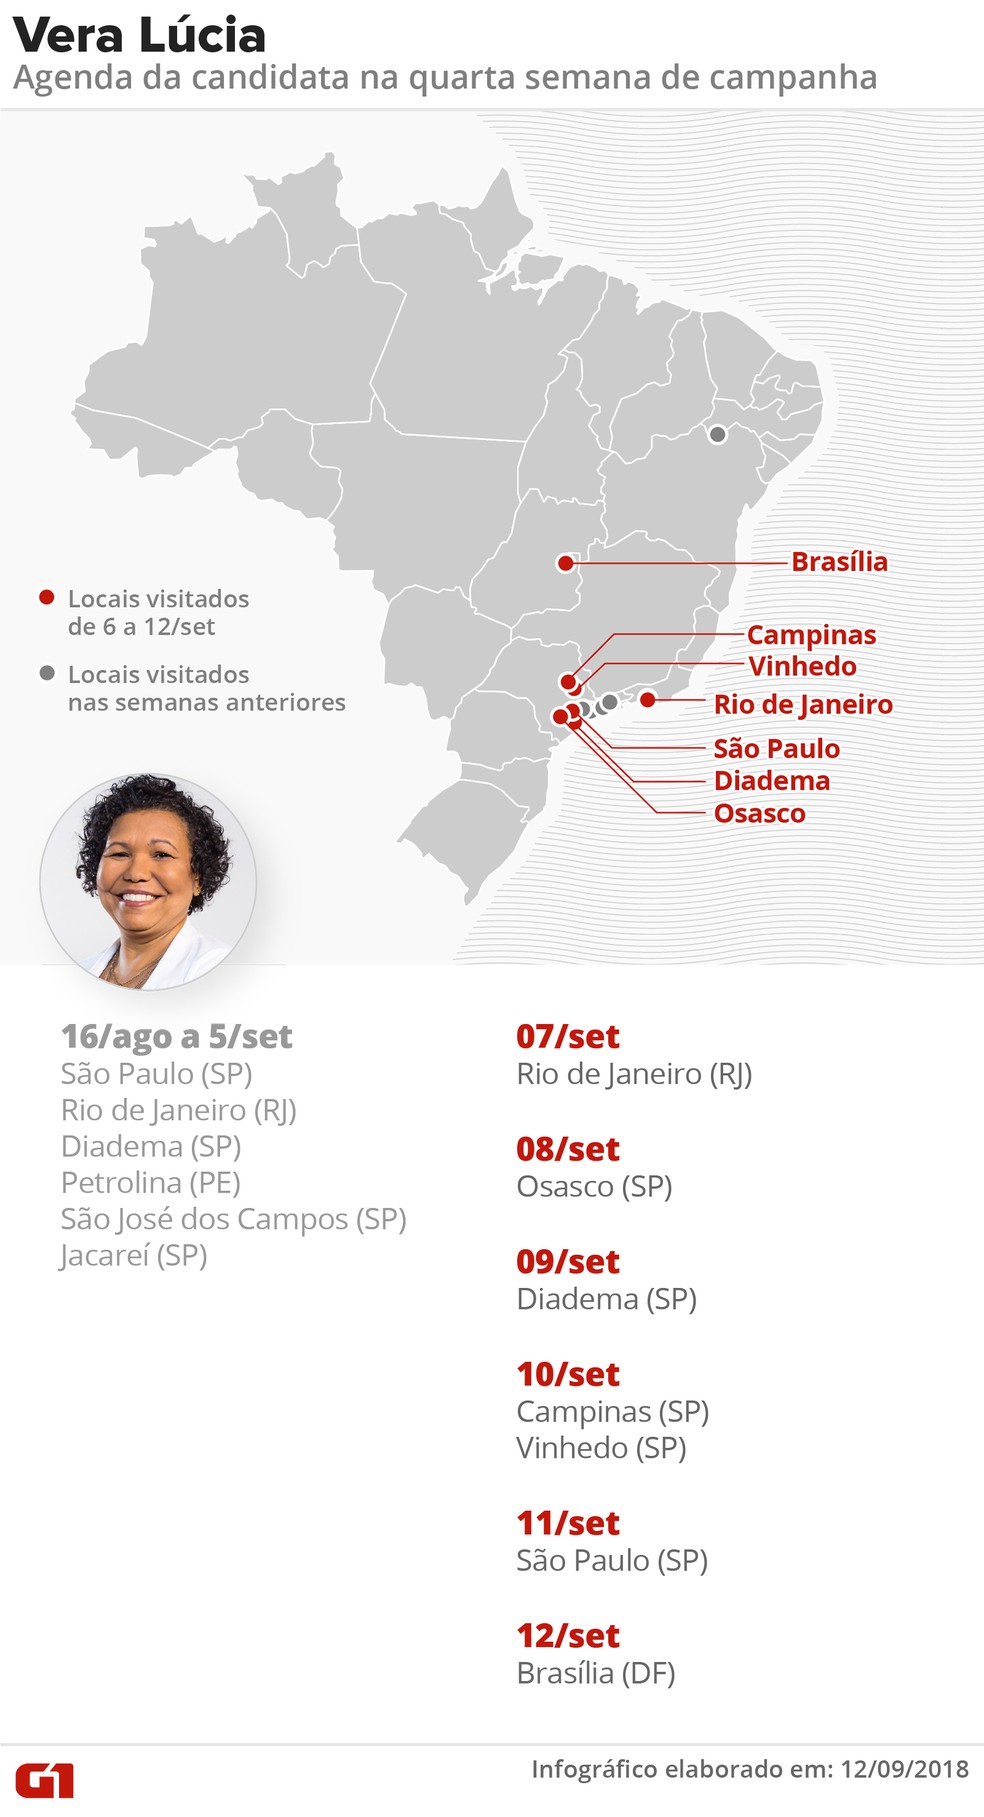 Agendas da candidata Vera Lucia (PSTU) na 4ª semana de campanha presidencial — Foto: Roberta Jaworski/G1